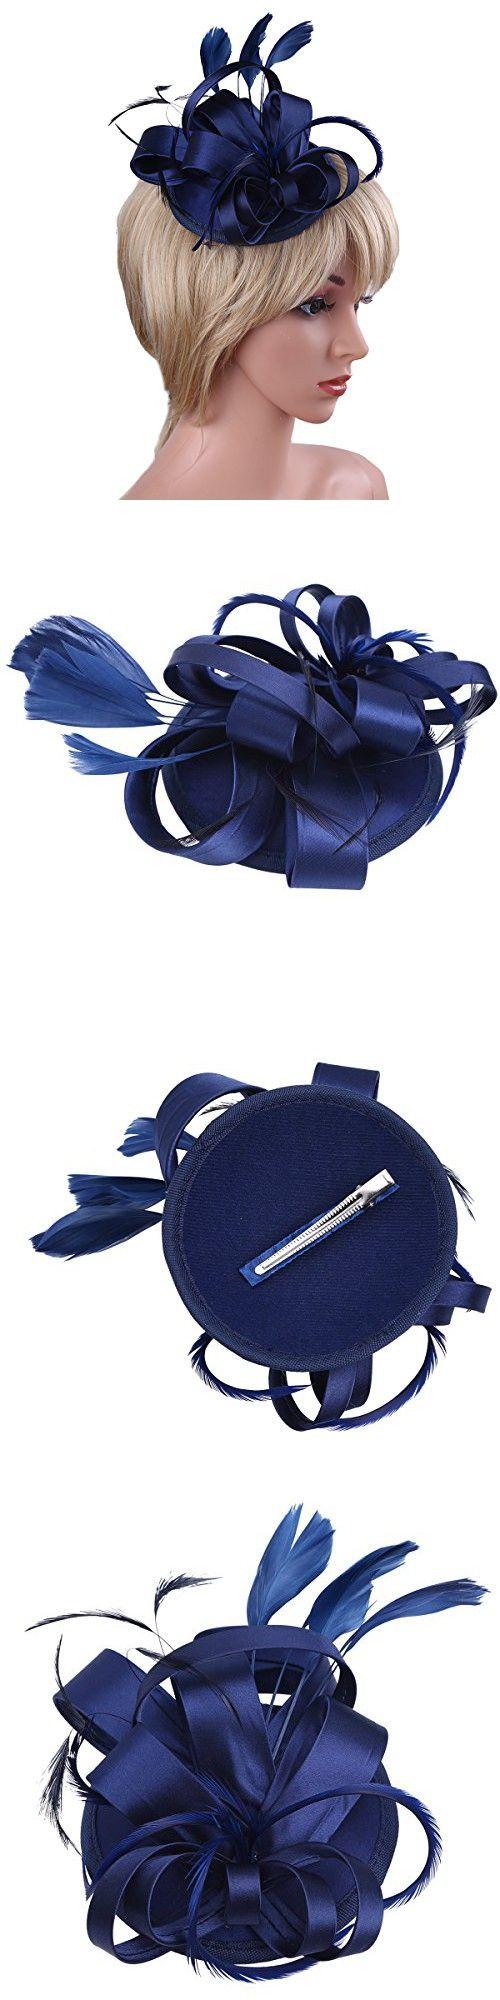 IEFiEL Lady Flowers Pillbox Fascinators Hat Cocktail Party Vintage Bridal Hair Clip Headwear Navy Blue One Size